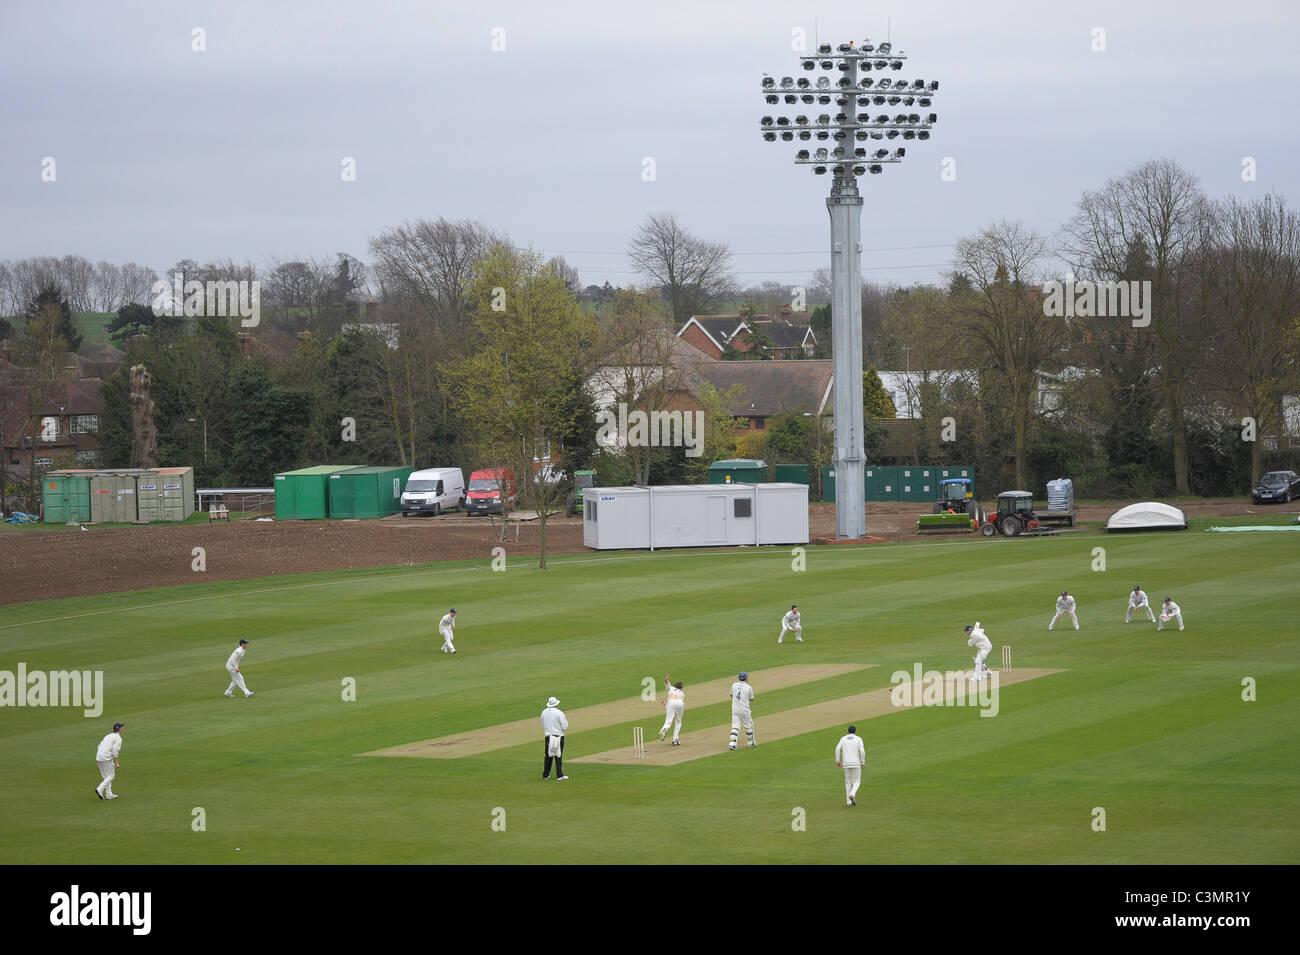 Kent County Cricket Club's St Lawrence Ground durant la pratique match contre Sussex, 5 avril 2011 Photo Stock